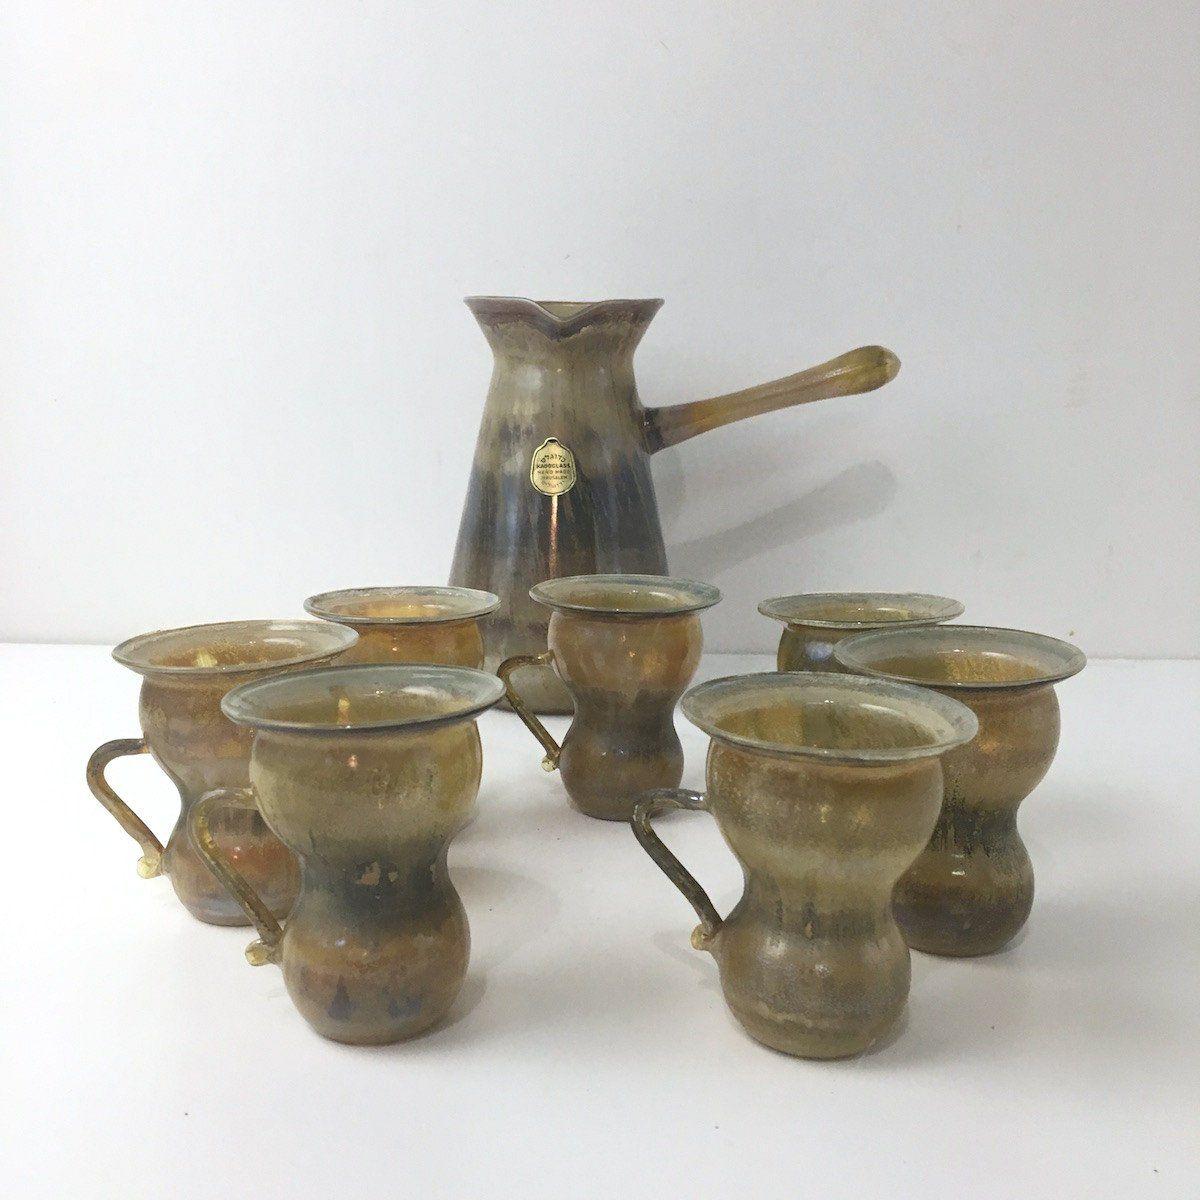 Vintage Kadoglass Ibrik Coffee Set Finzan Server 6 Fincan Iwaki Water Drip 4 Cup Cups Israeli Art